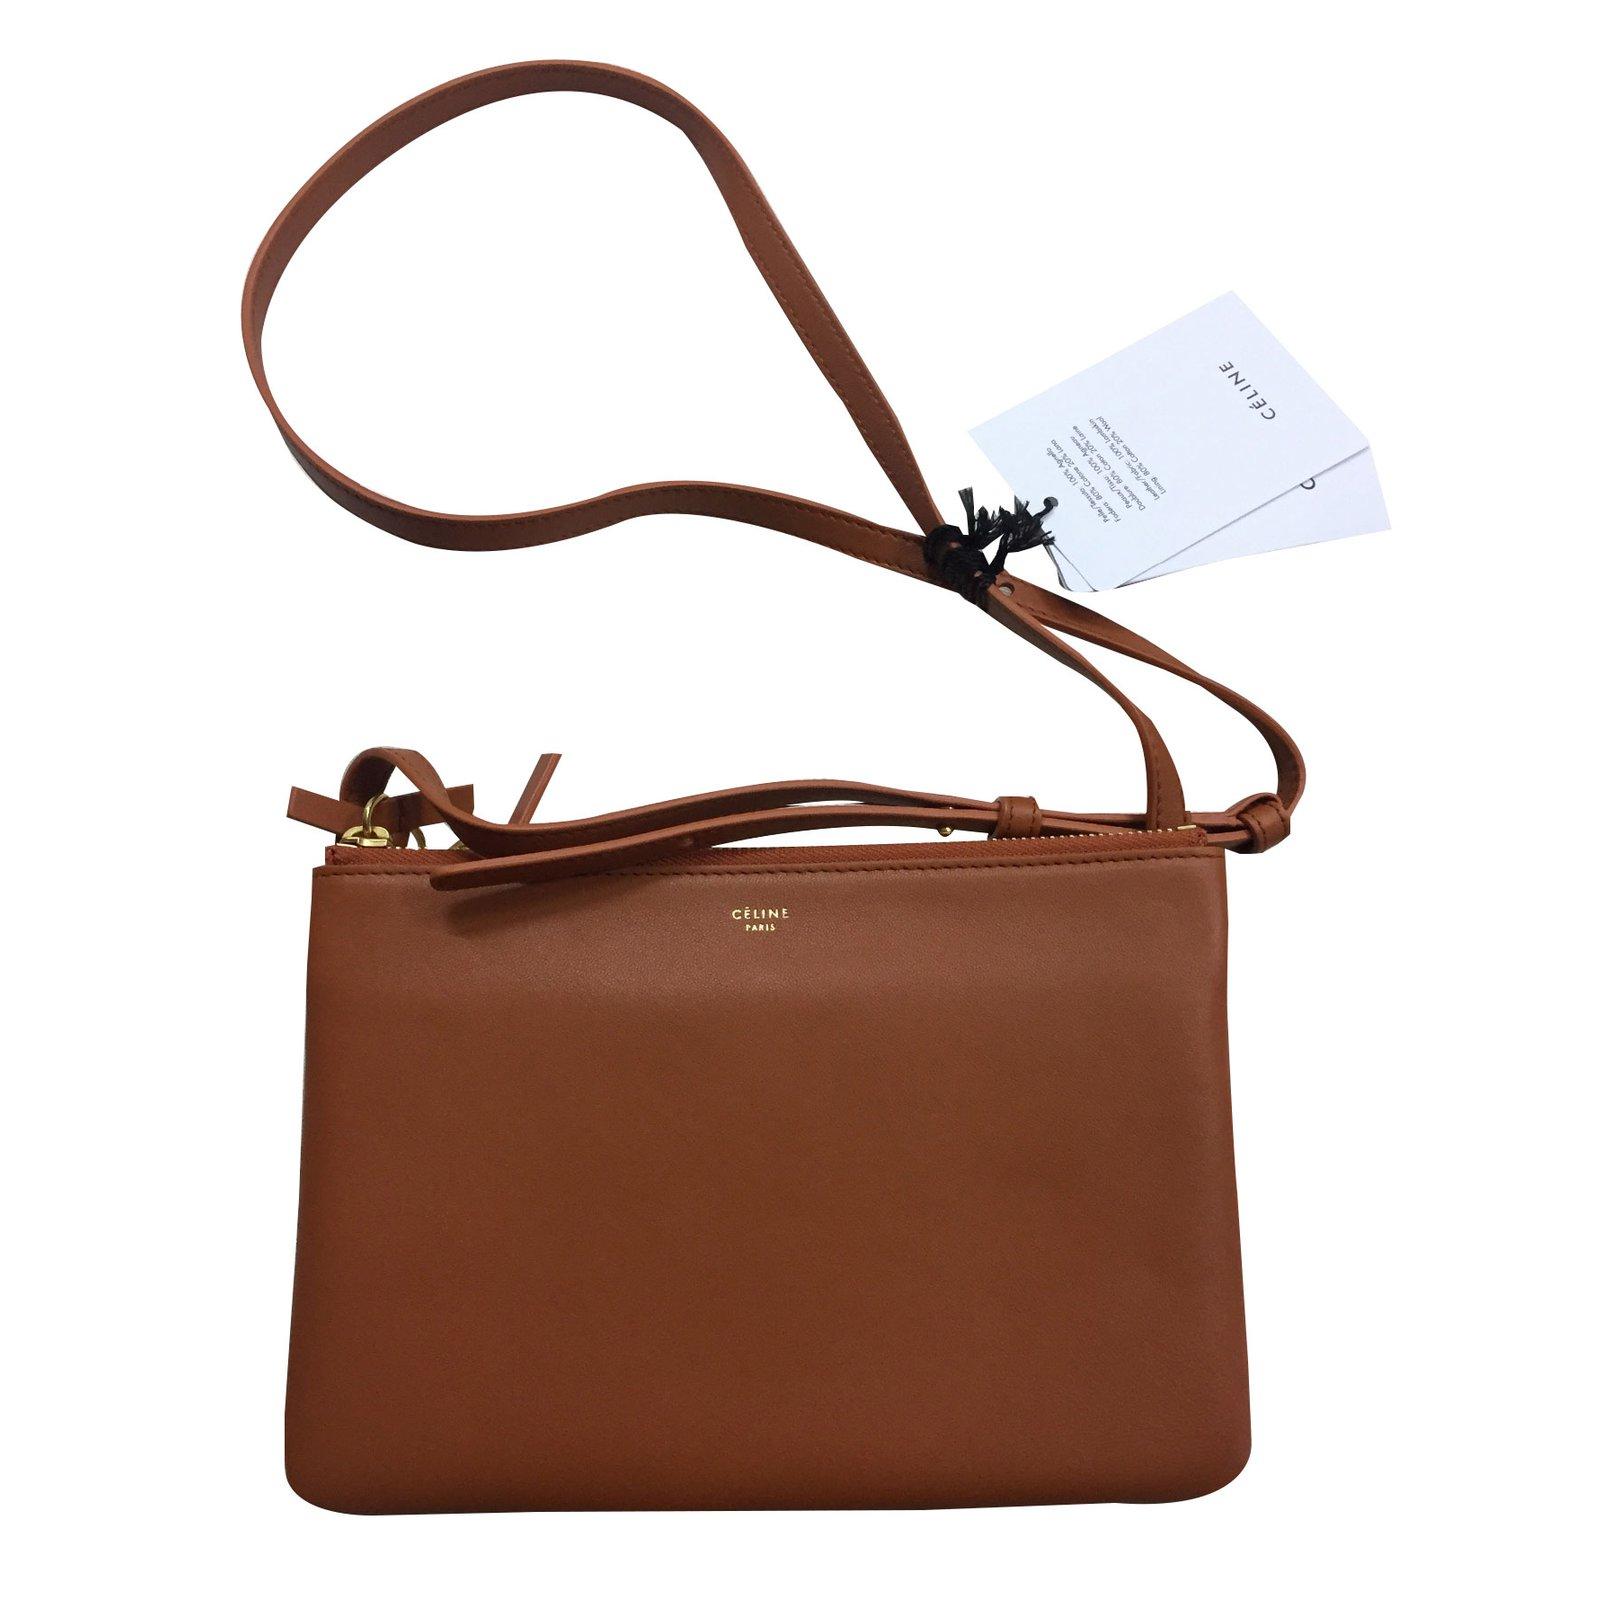 Céline Trio Handbags Leather Caramel Ref 27982